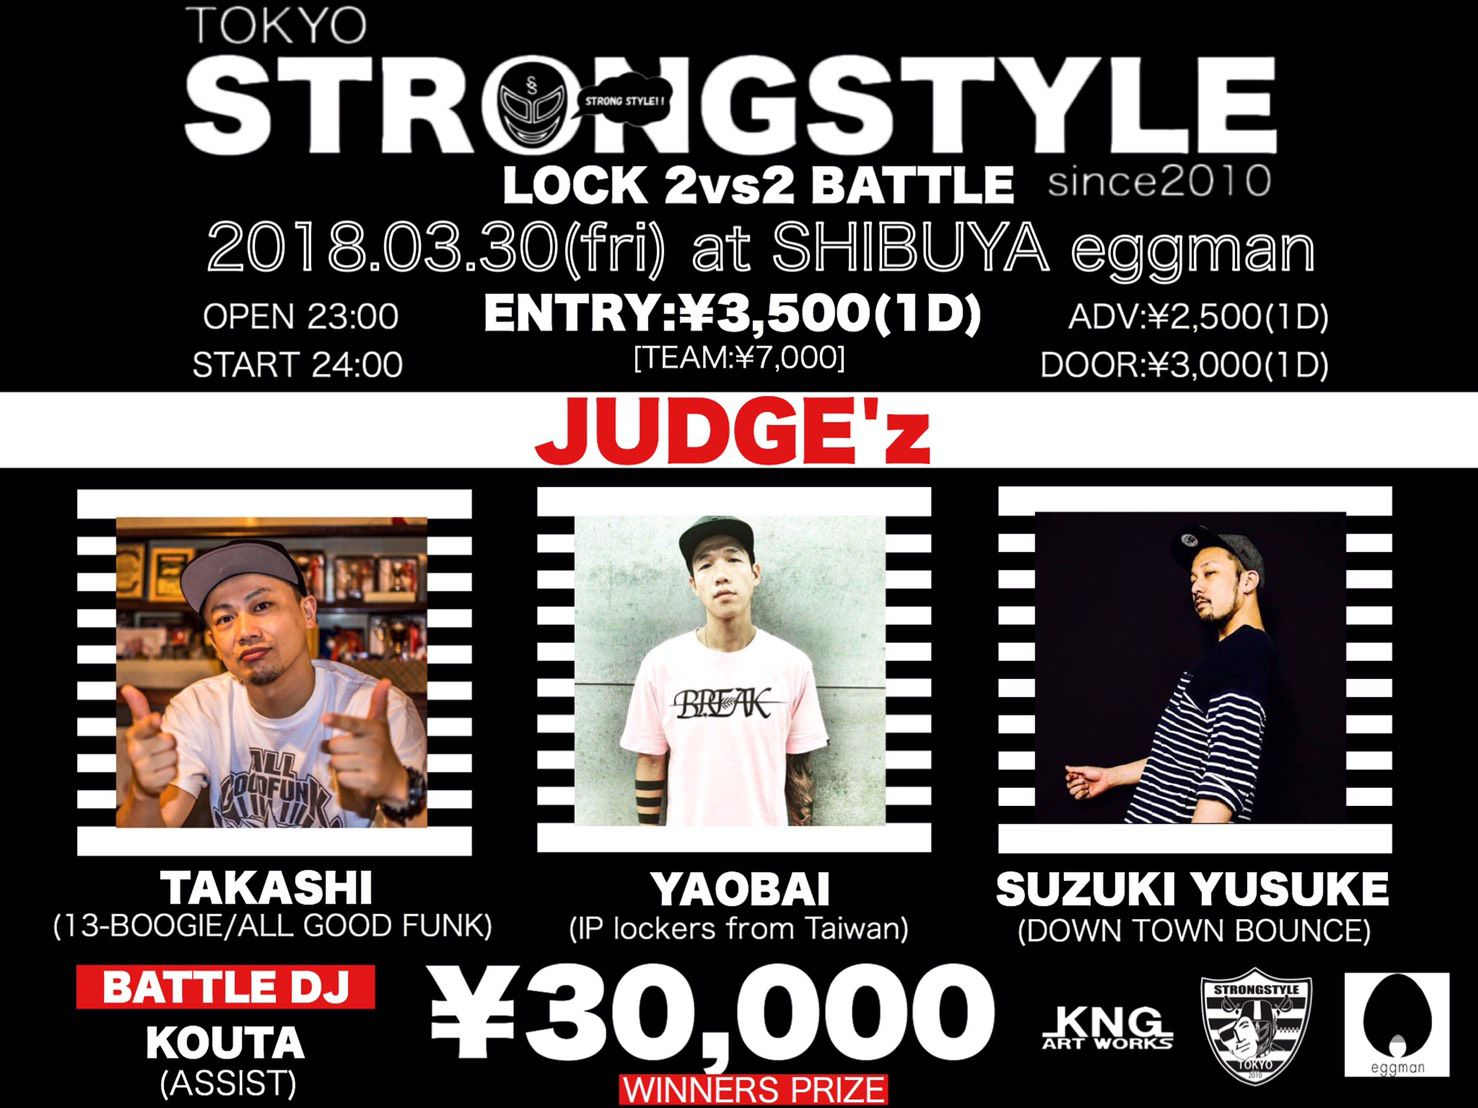 STRONG STYLE vol,11 -LOCK 2vs2 BATTLE-